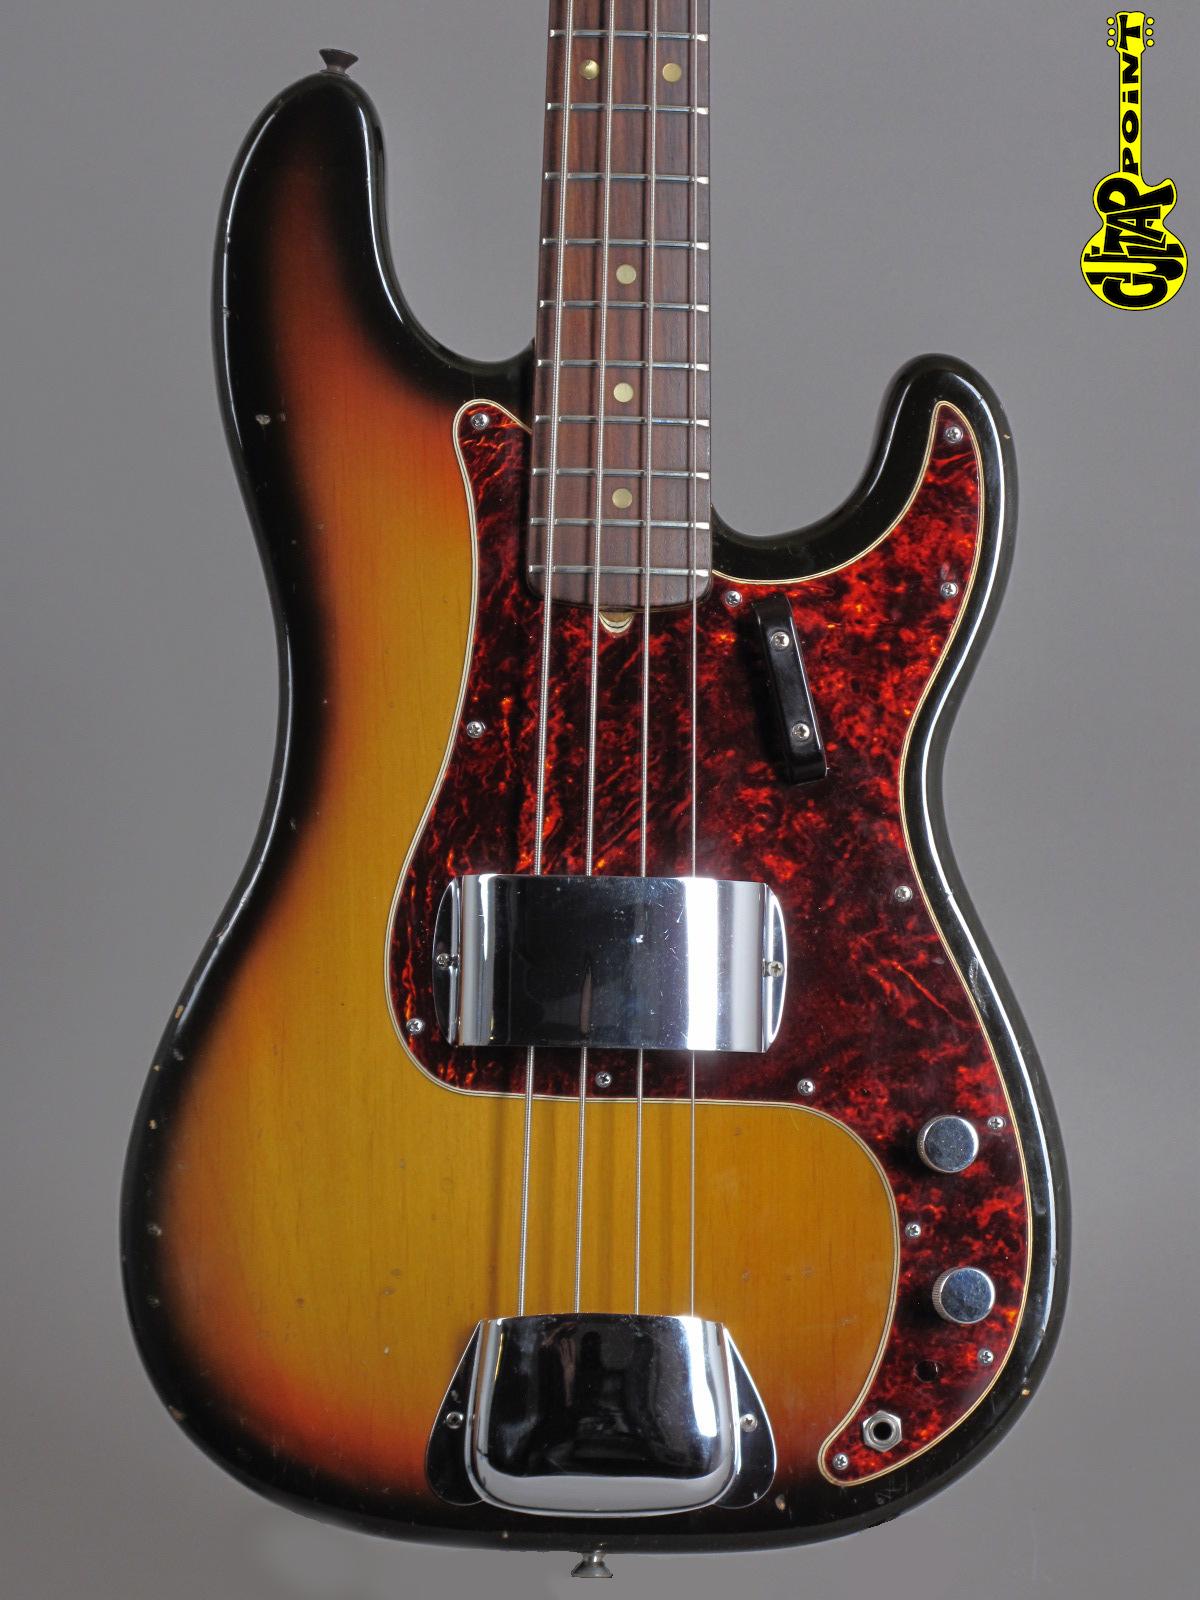 1971 Fender Precision Bass - Sunburst